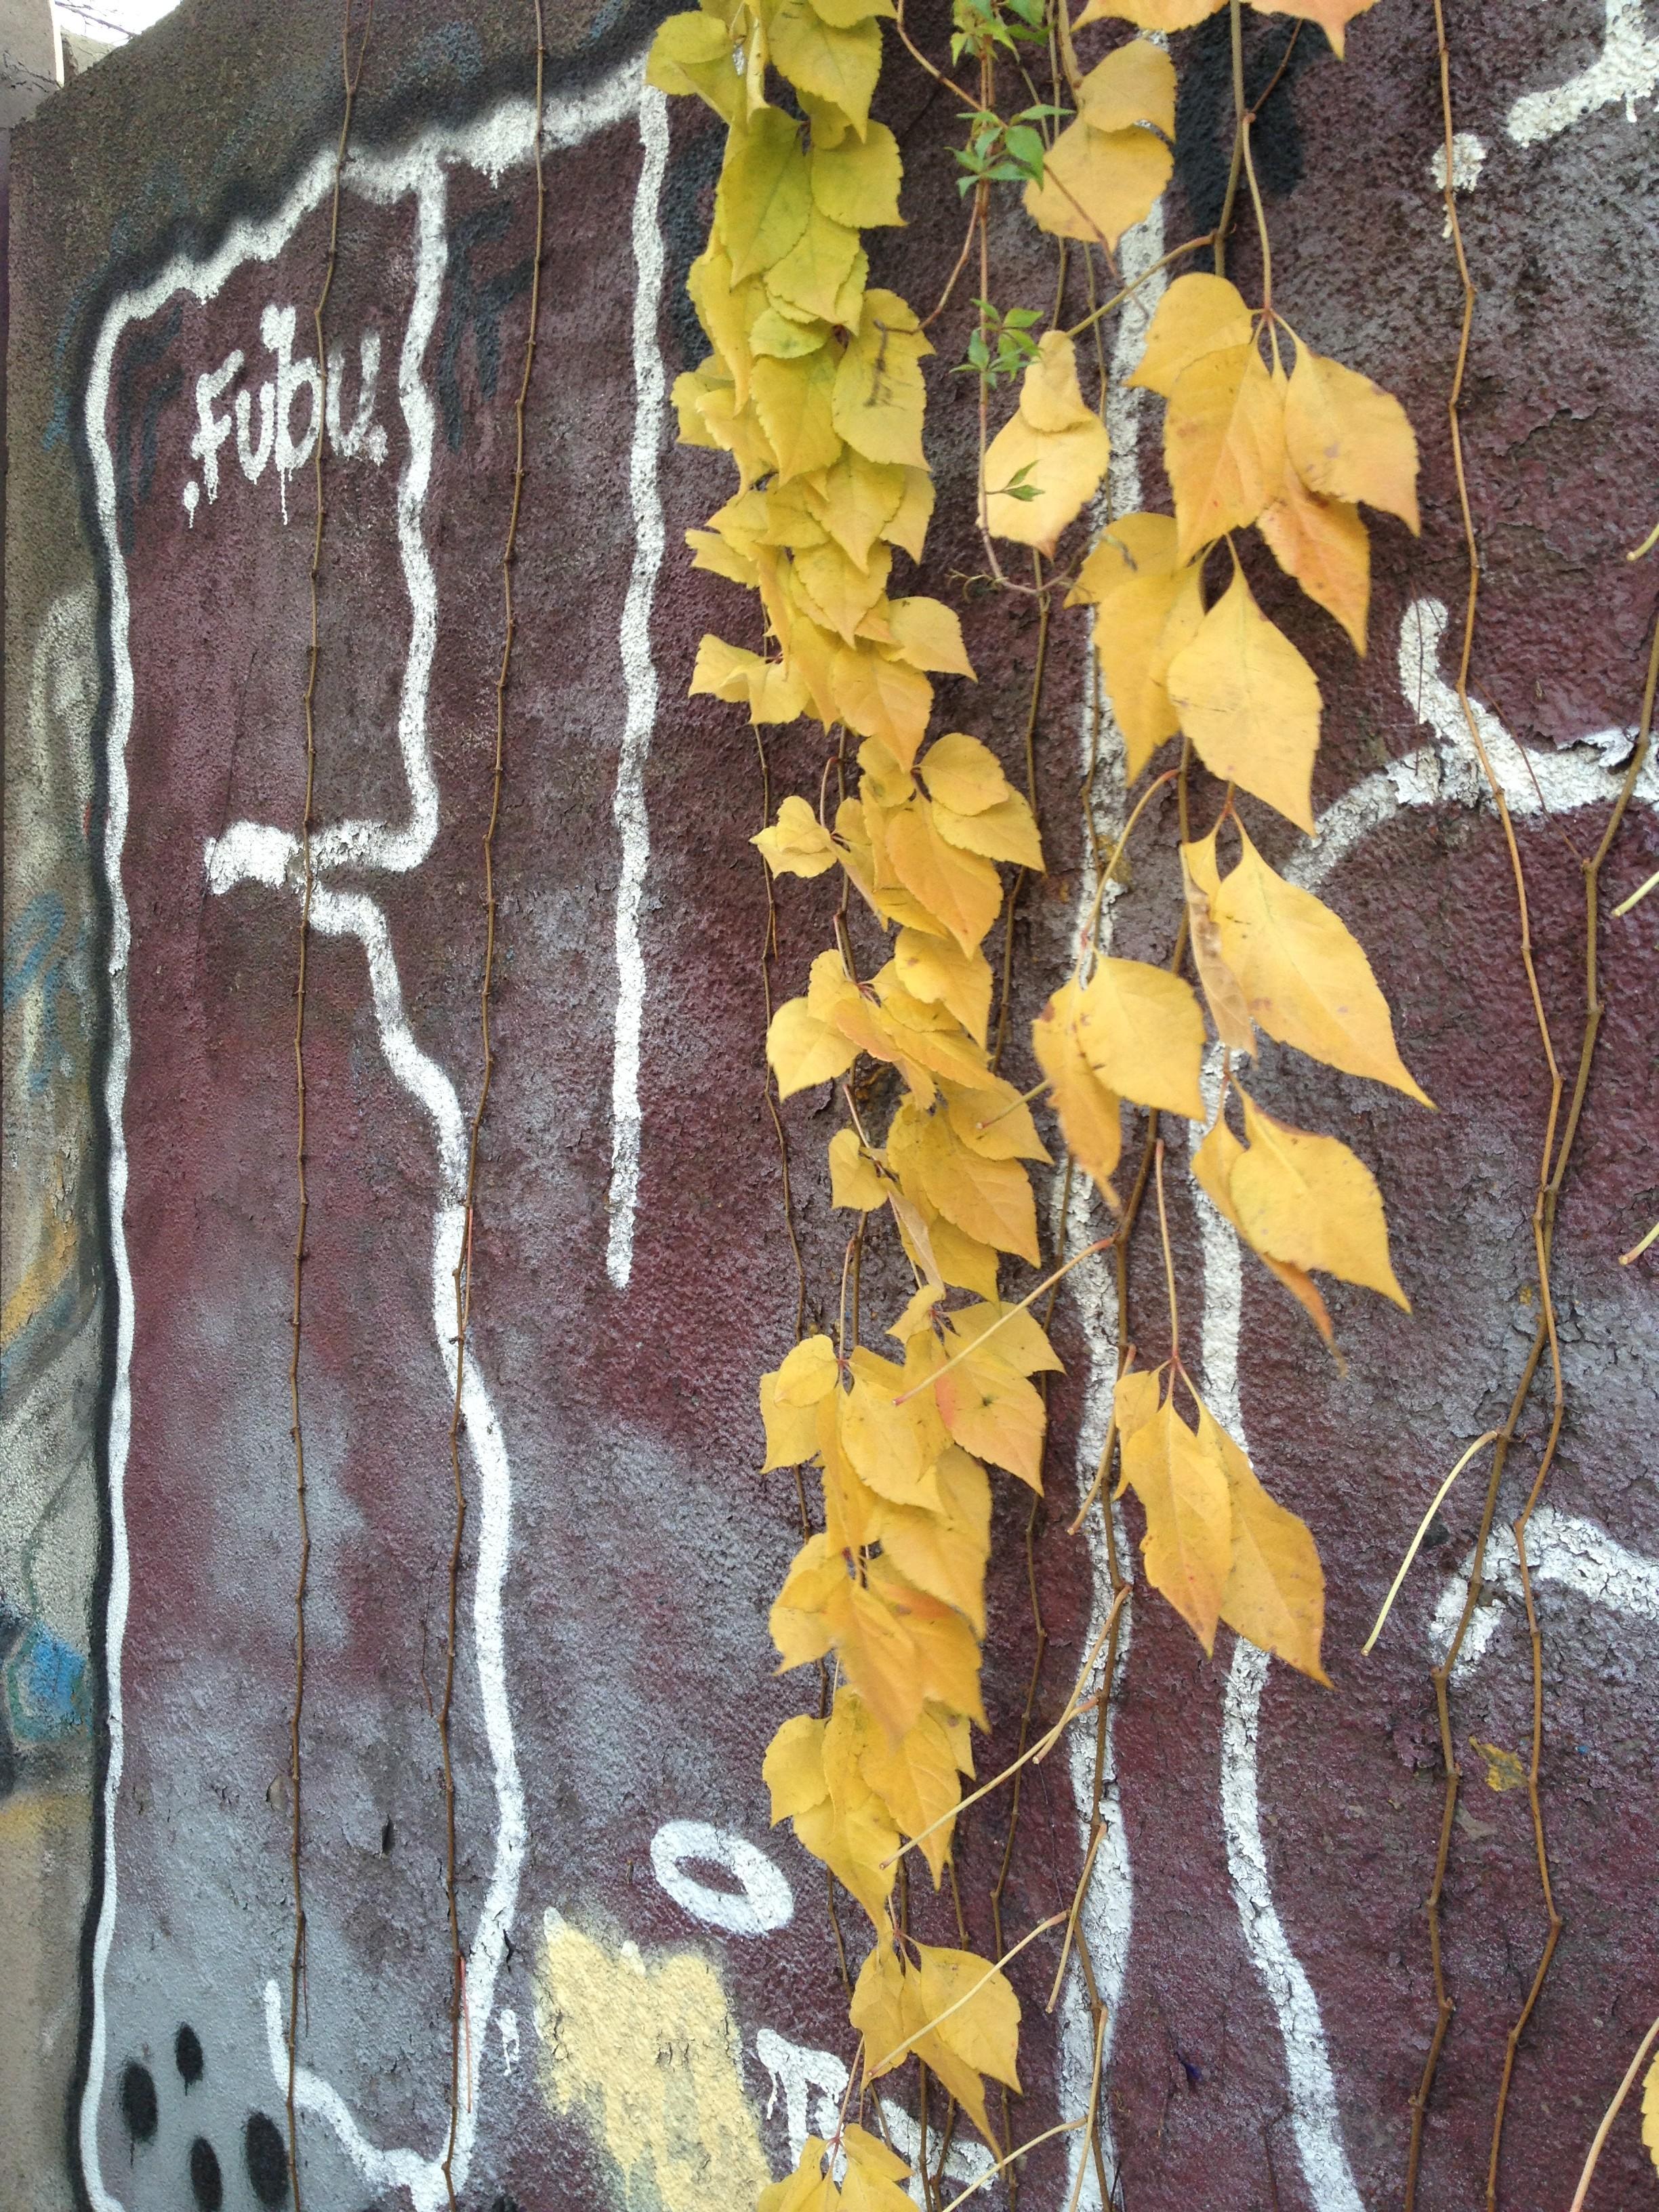 oslo, travel, trip, vigeland, statues, graffiti, autumn, november